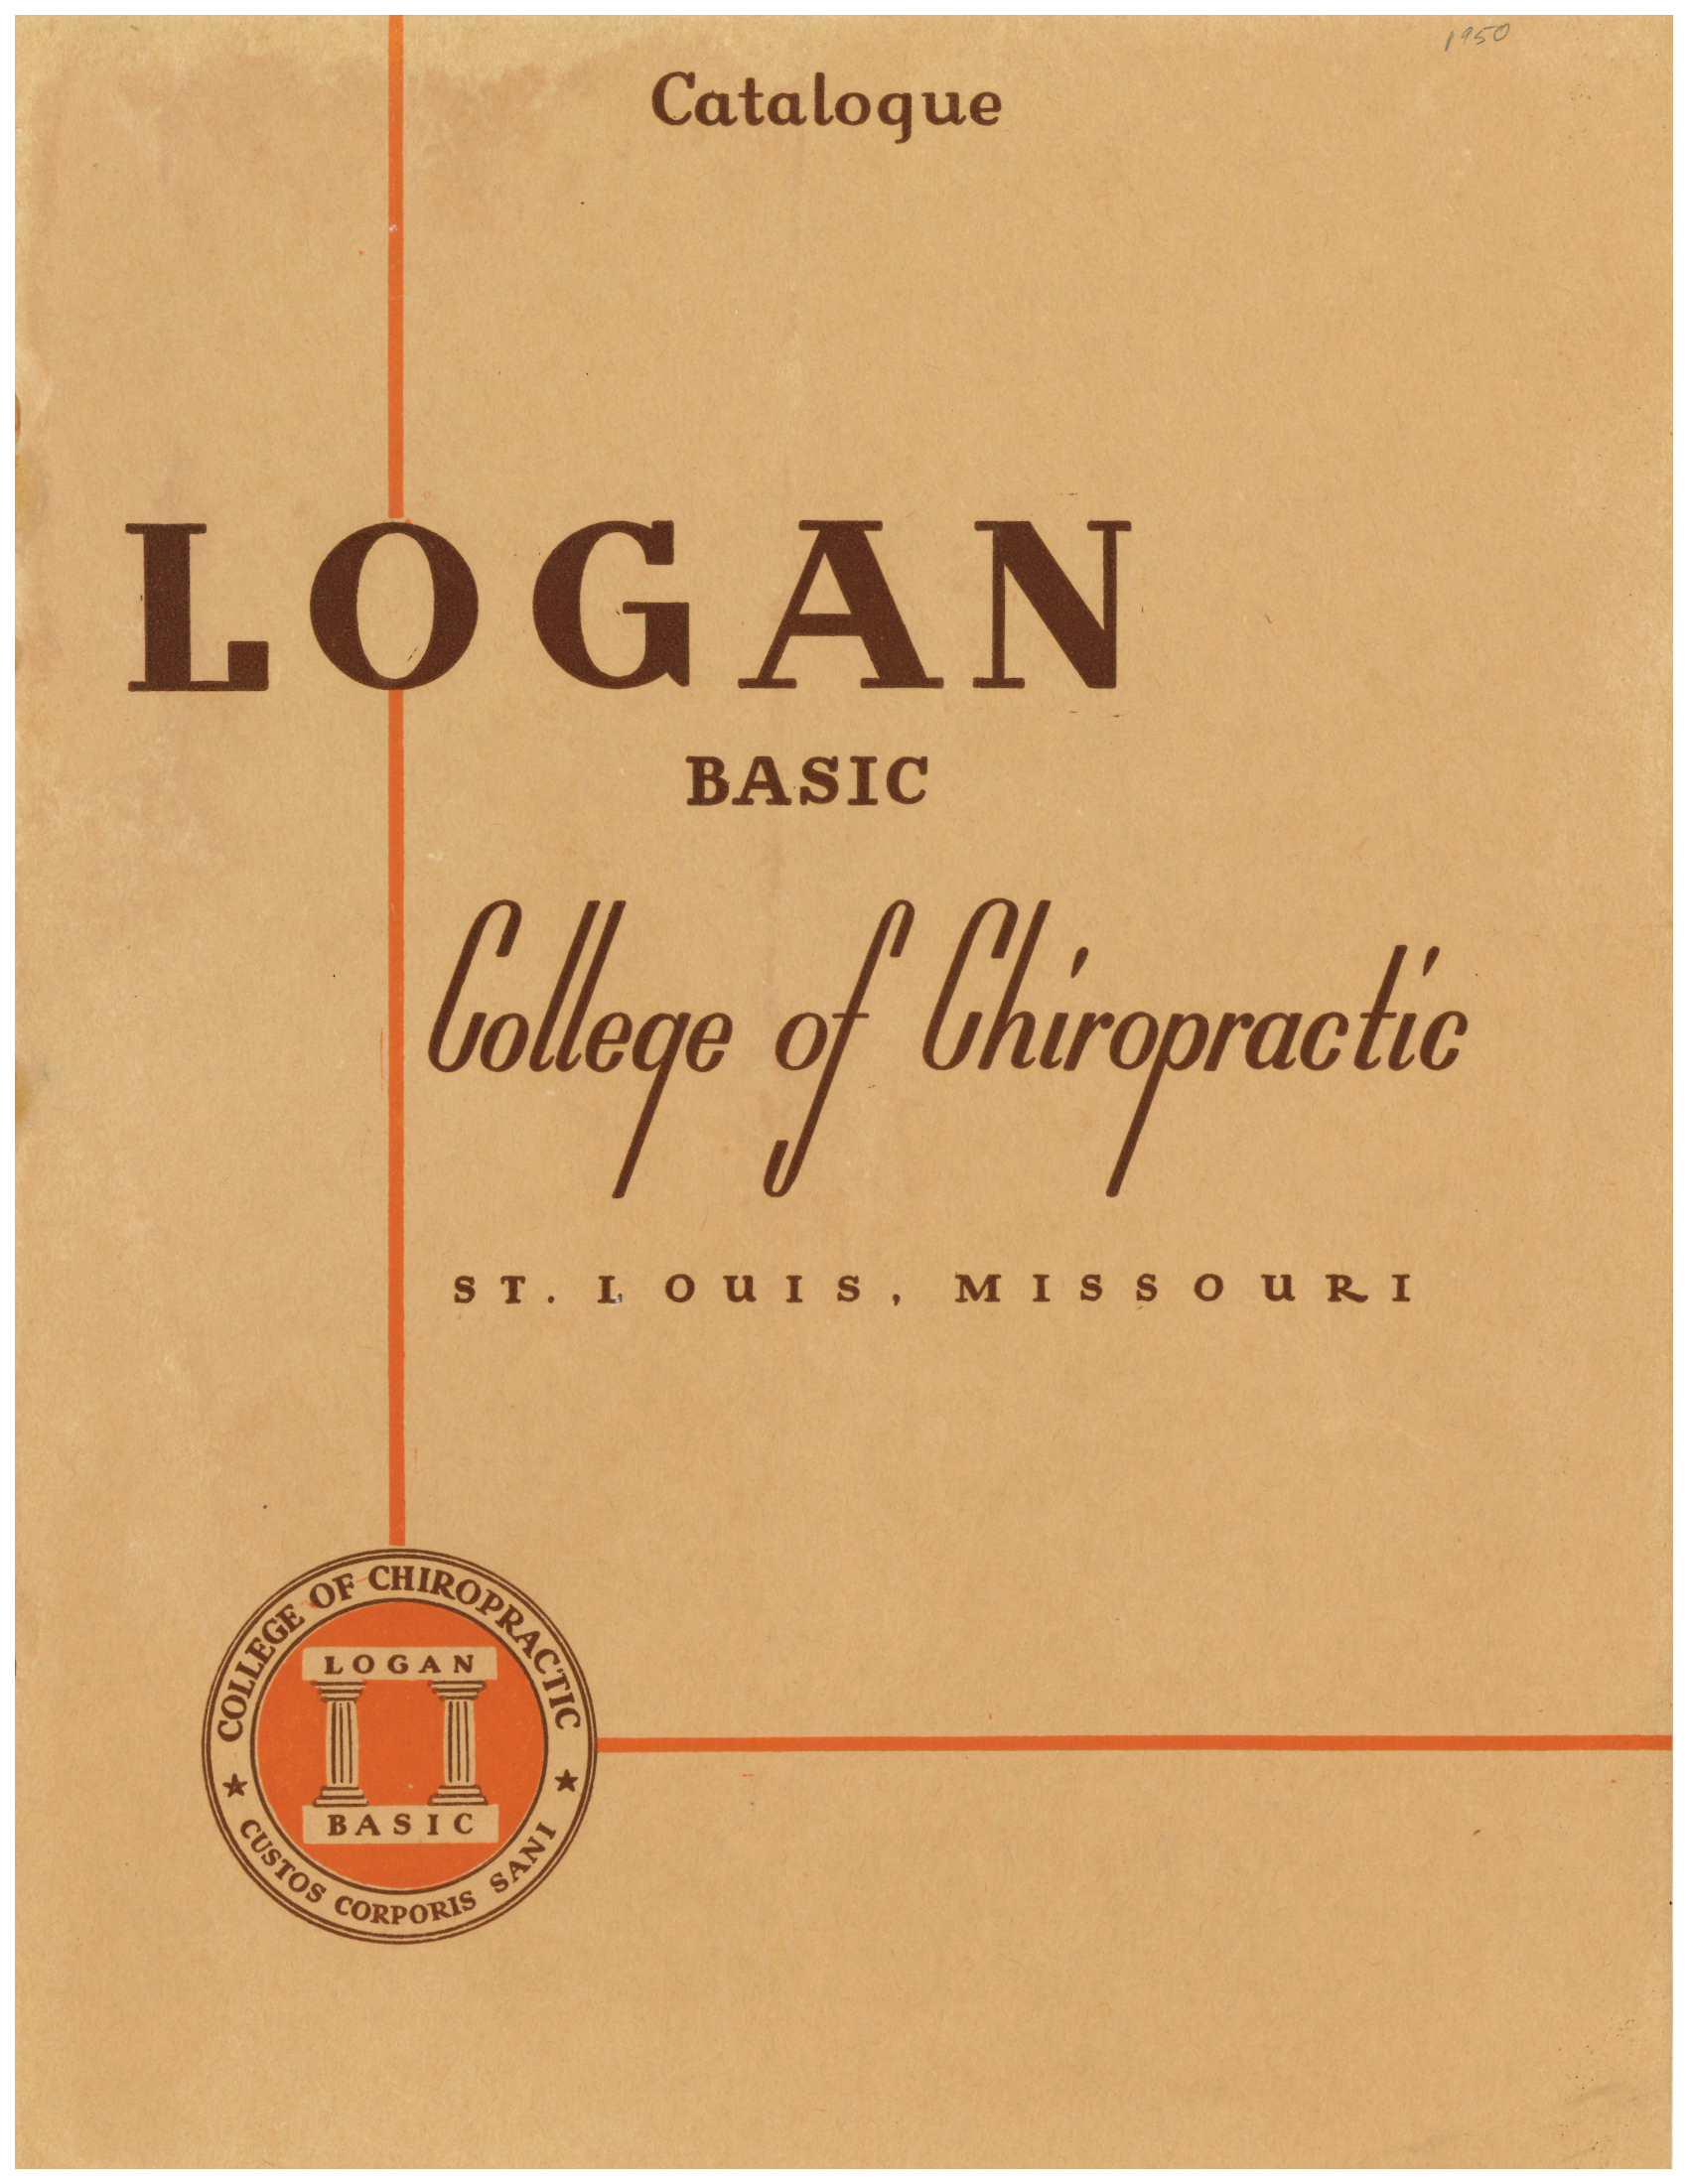 Logan 1951 catalog cover